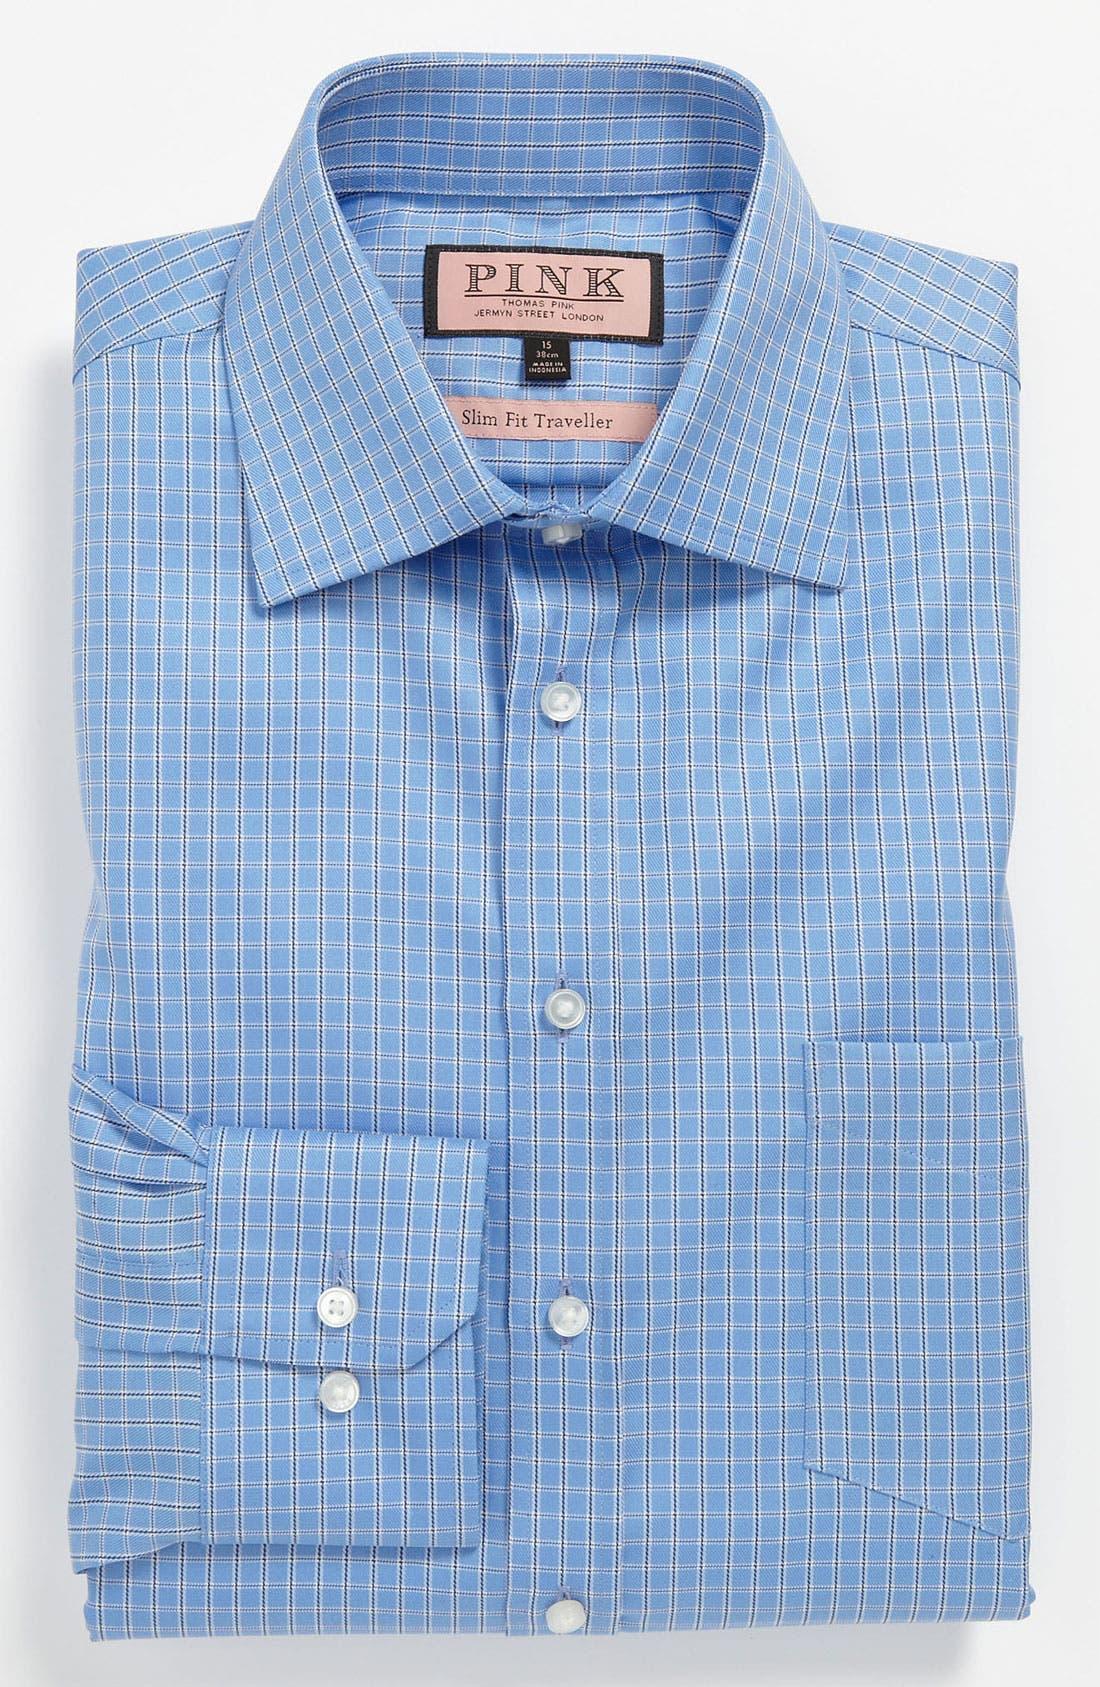 Alternate Image 1 Selected - Thomas Pink Slim Fit Traveller Dress Shirt